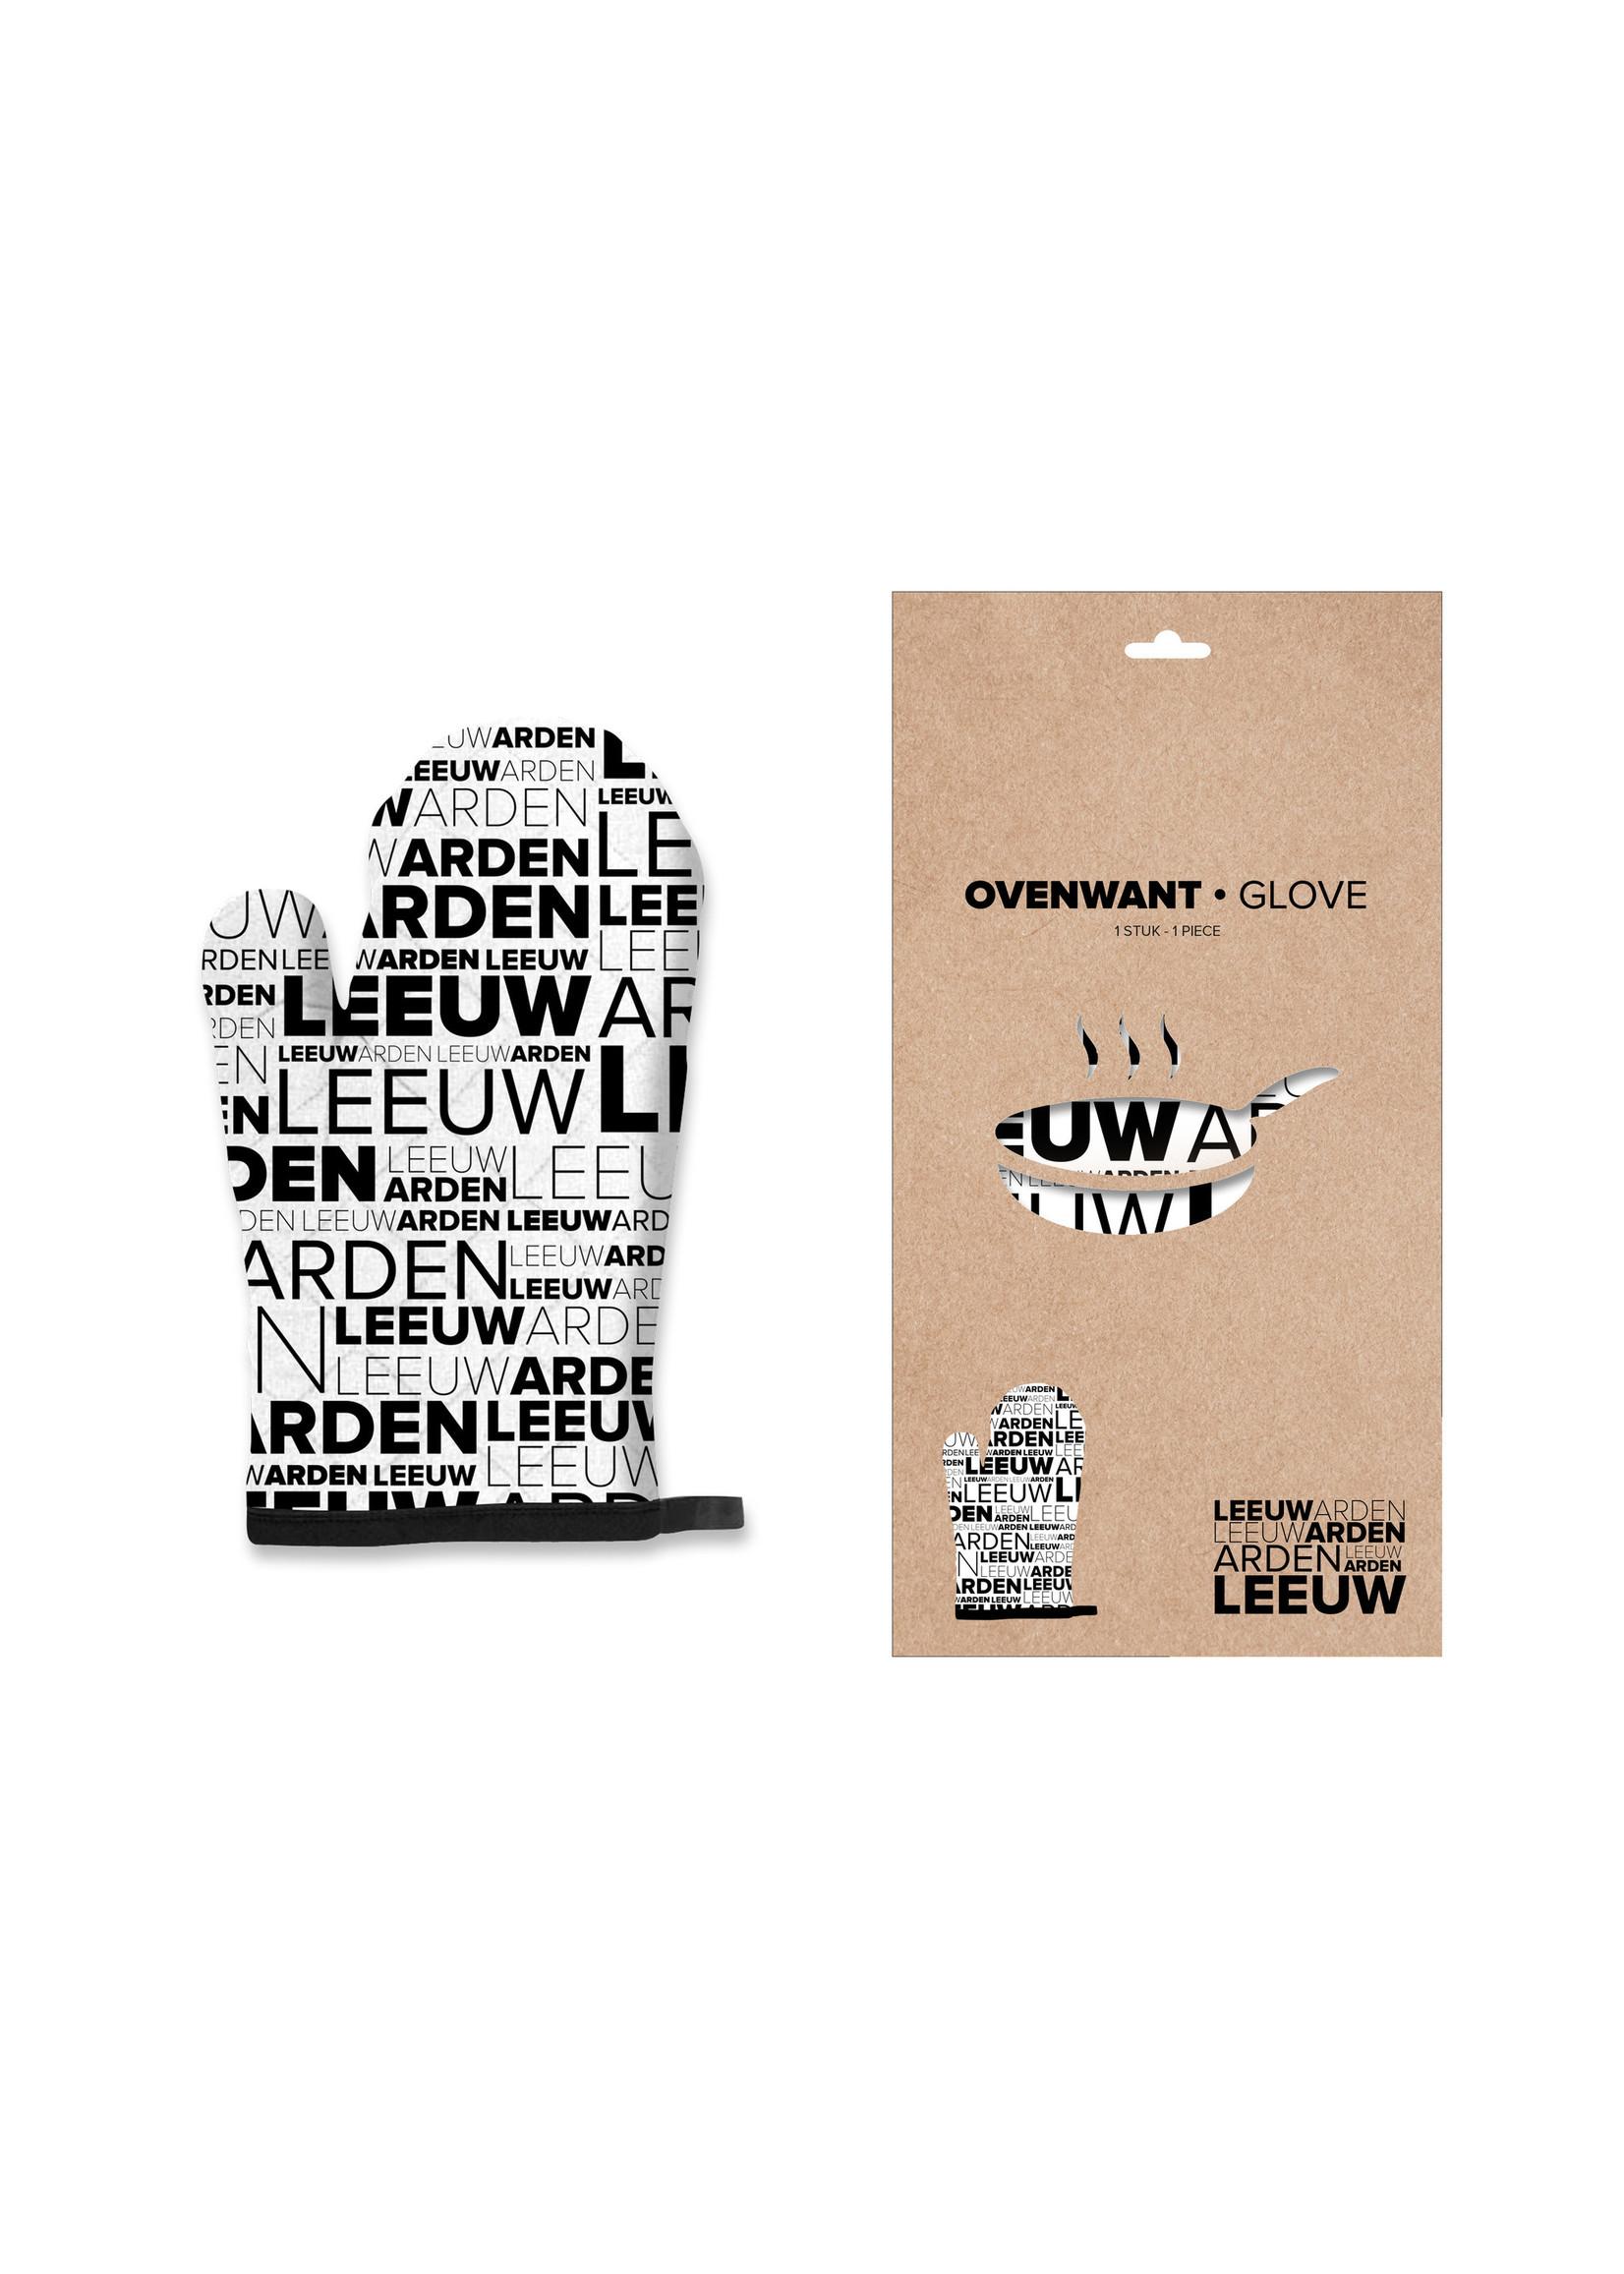 OVENWANT LEEUWARDEN